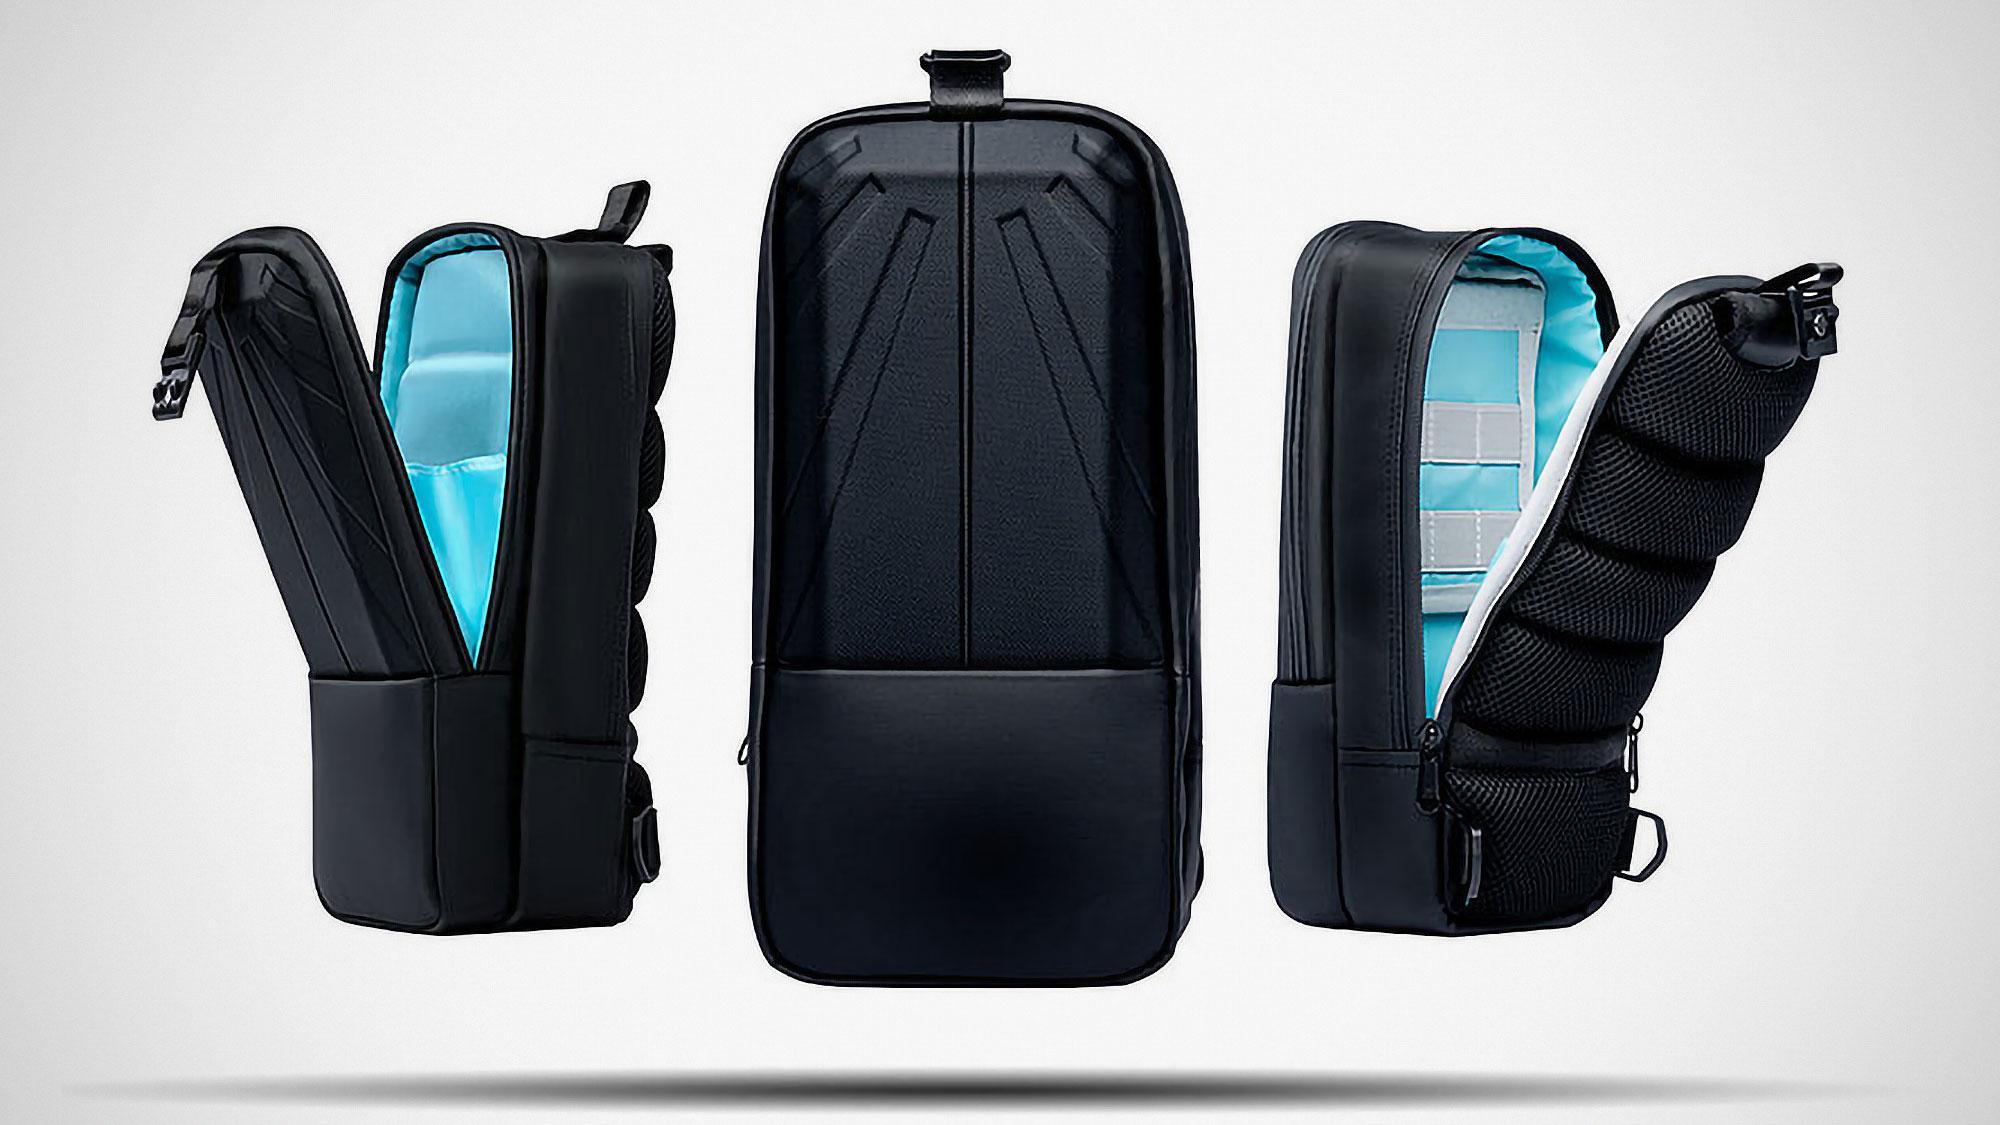 MagGo Nintendo Switch Carry Bag by Ultix Outdoors